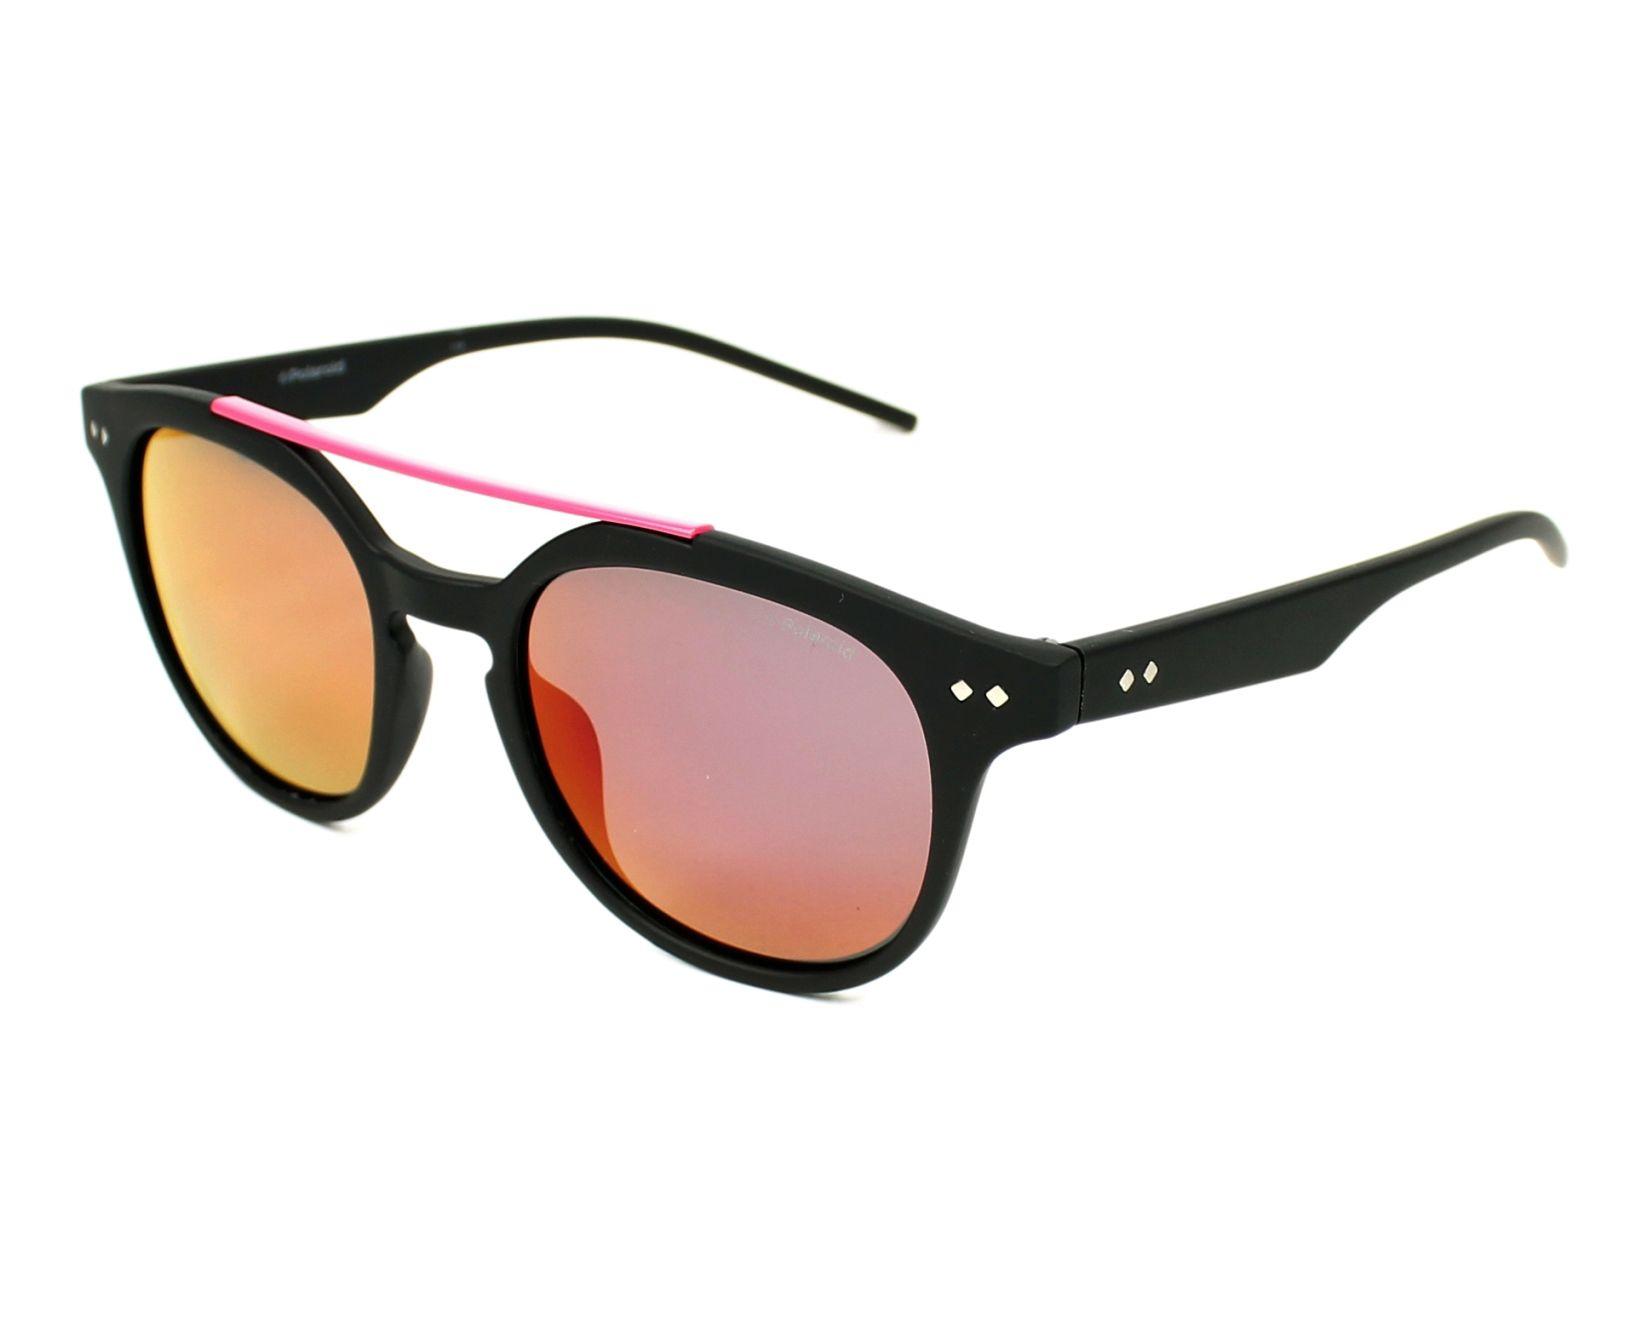 c1b3f74380 Polarizadas. Gafas de sol Polaroid PLD-1023-S DL5/AI 51-20 Negra